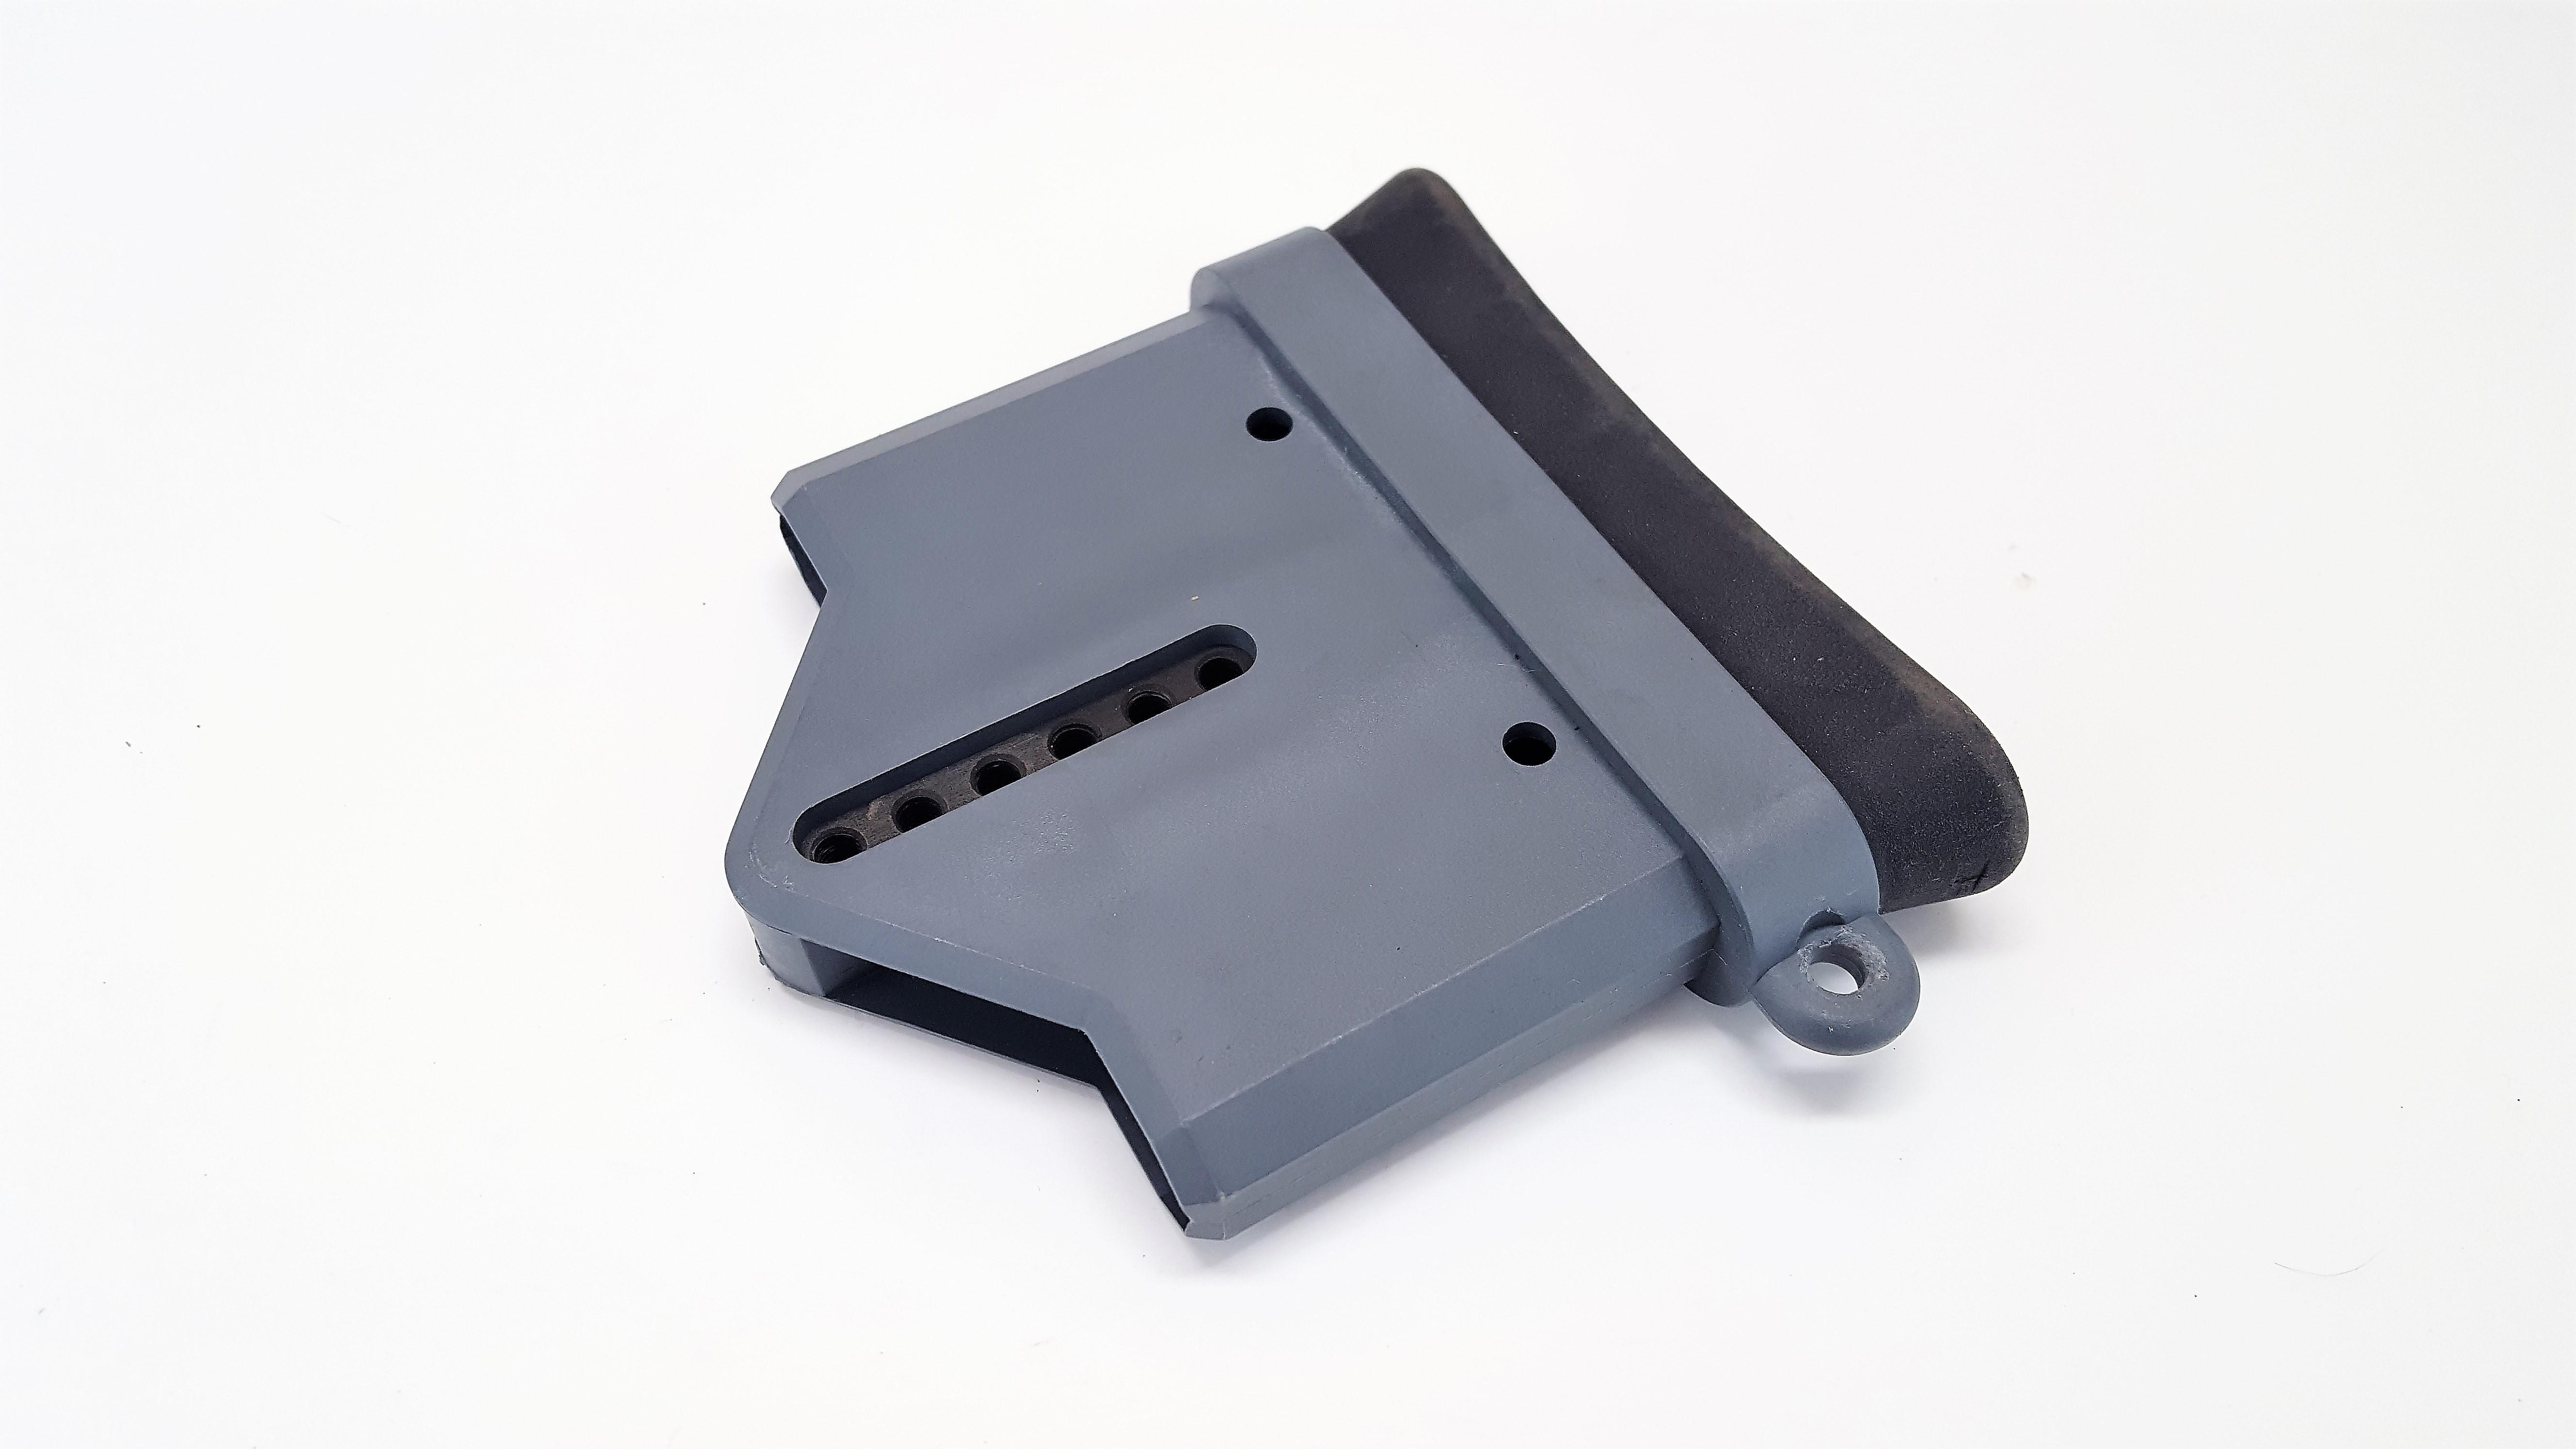 Hk sl8 adjustable buttstock piece used gray for Portent g3 sl 8